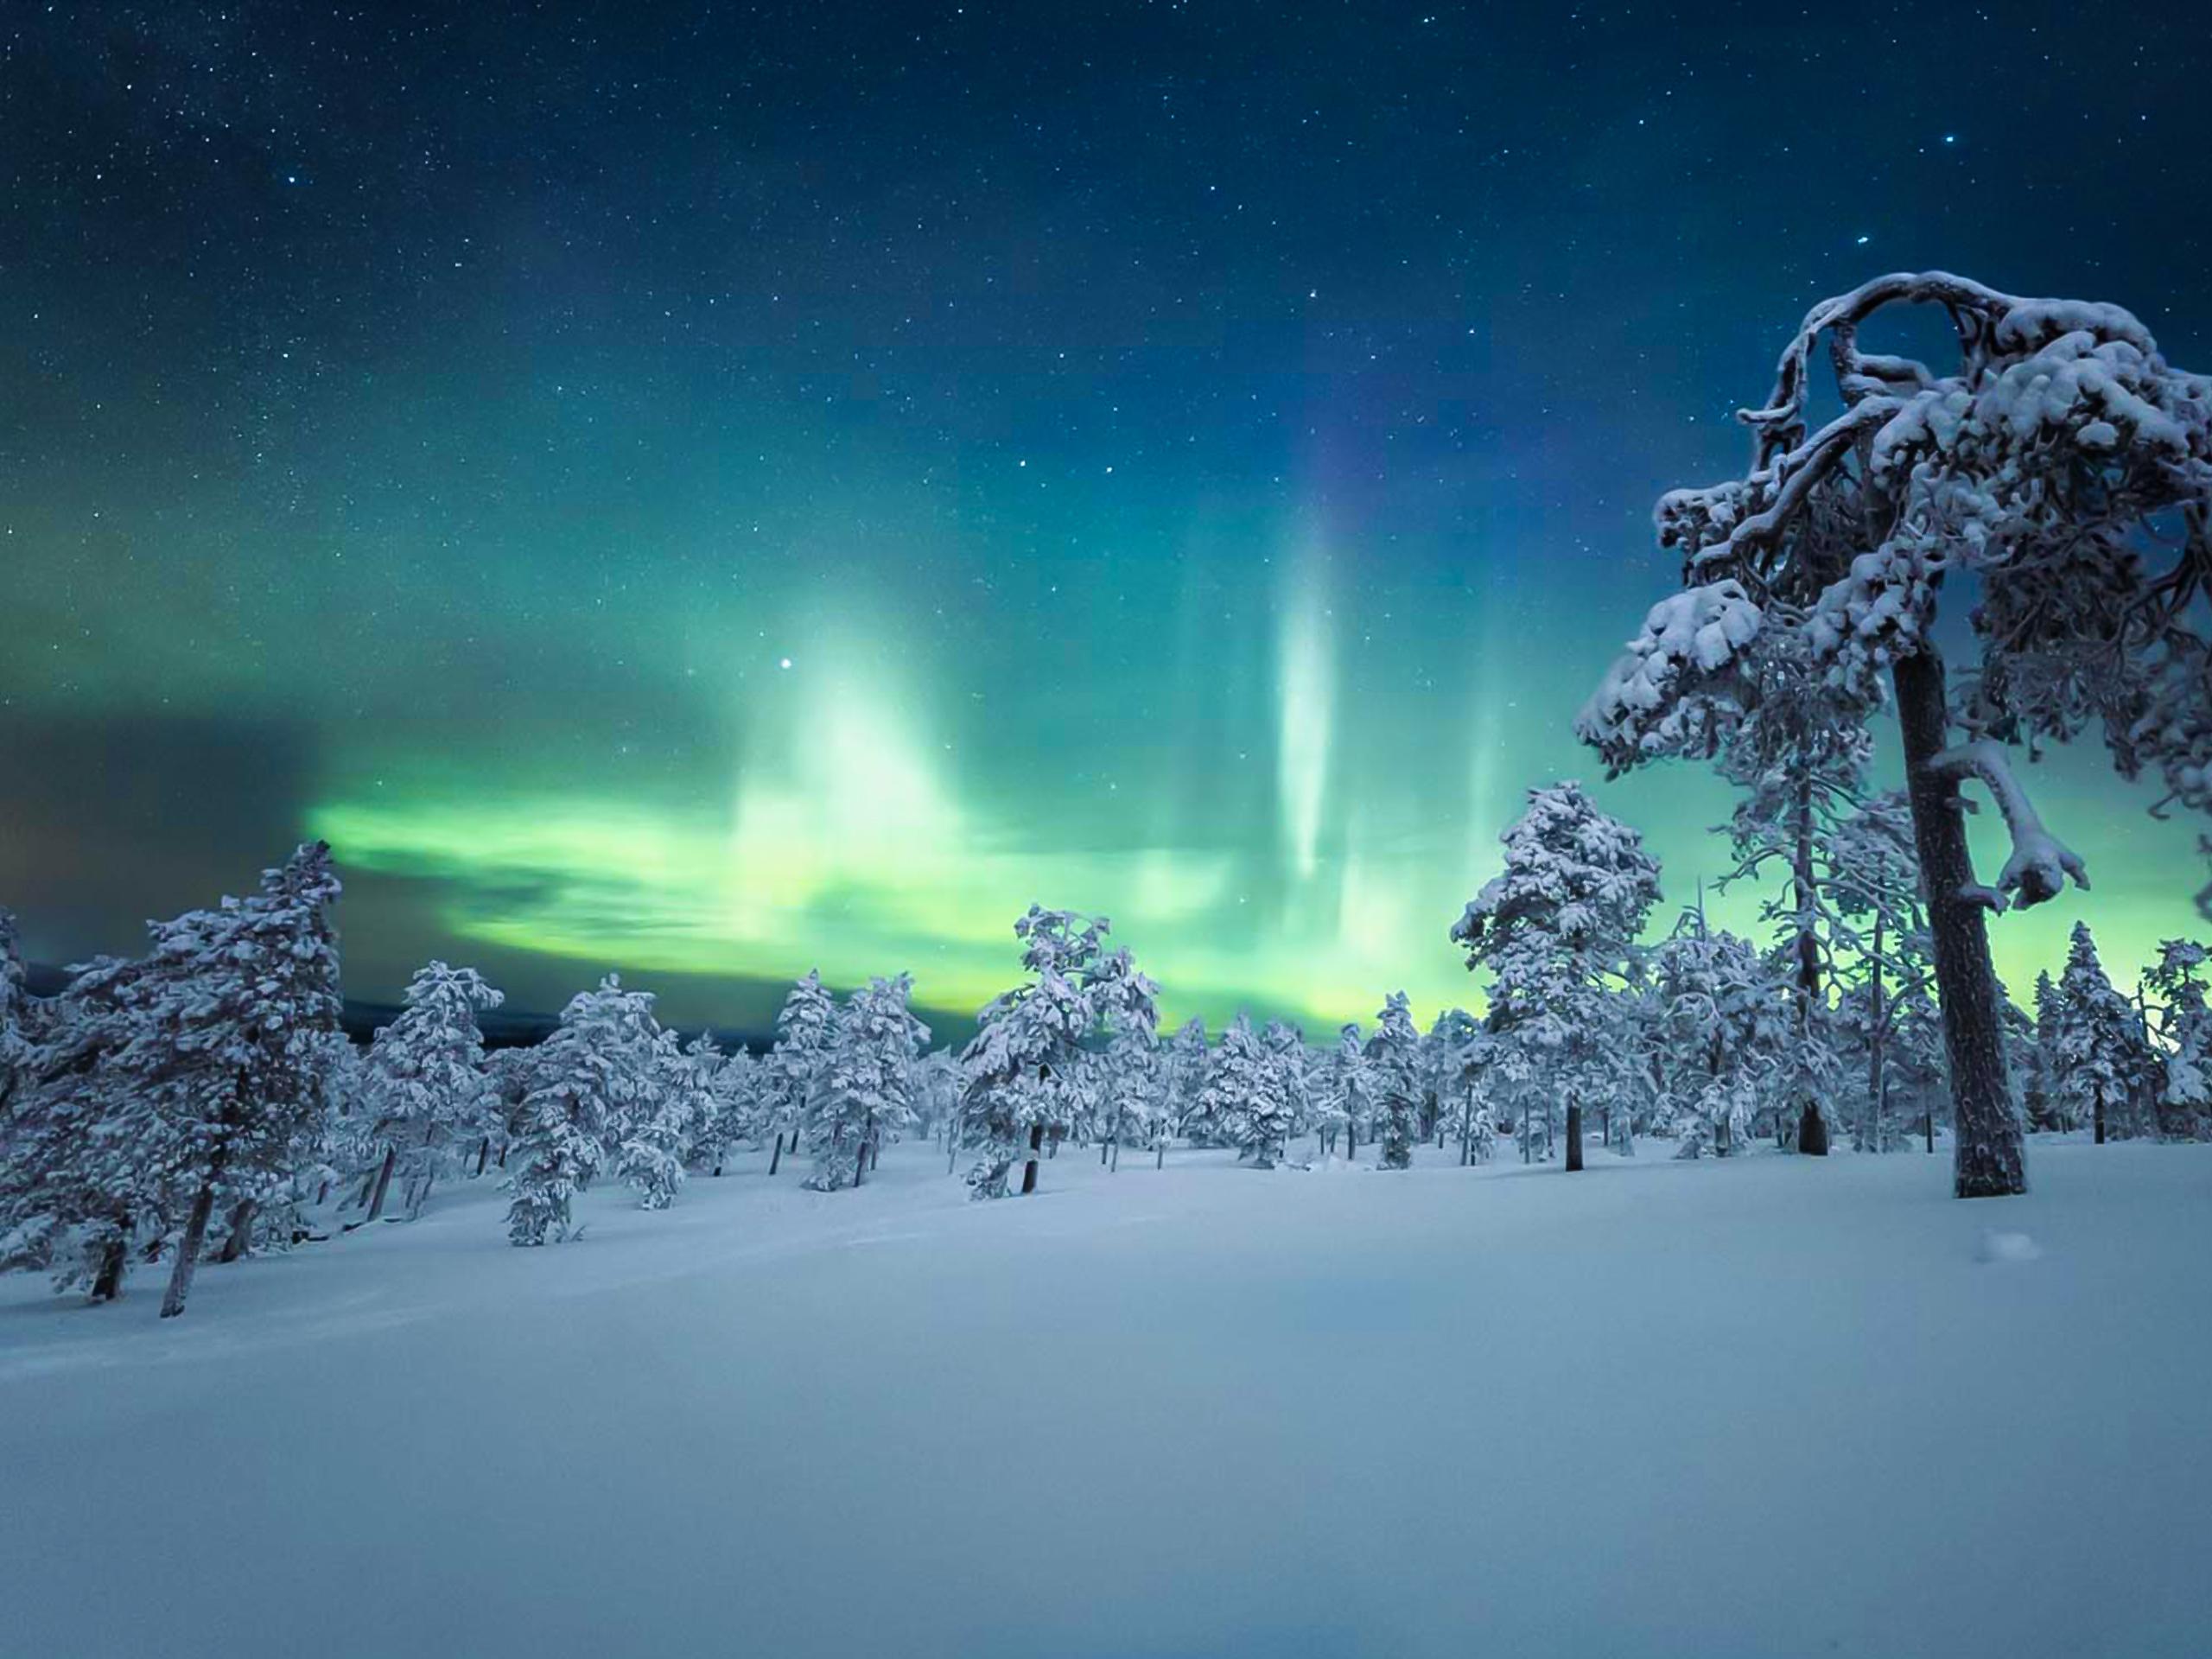 Aurora Borealis Lights Up the Night Sky